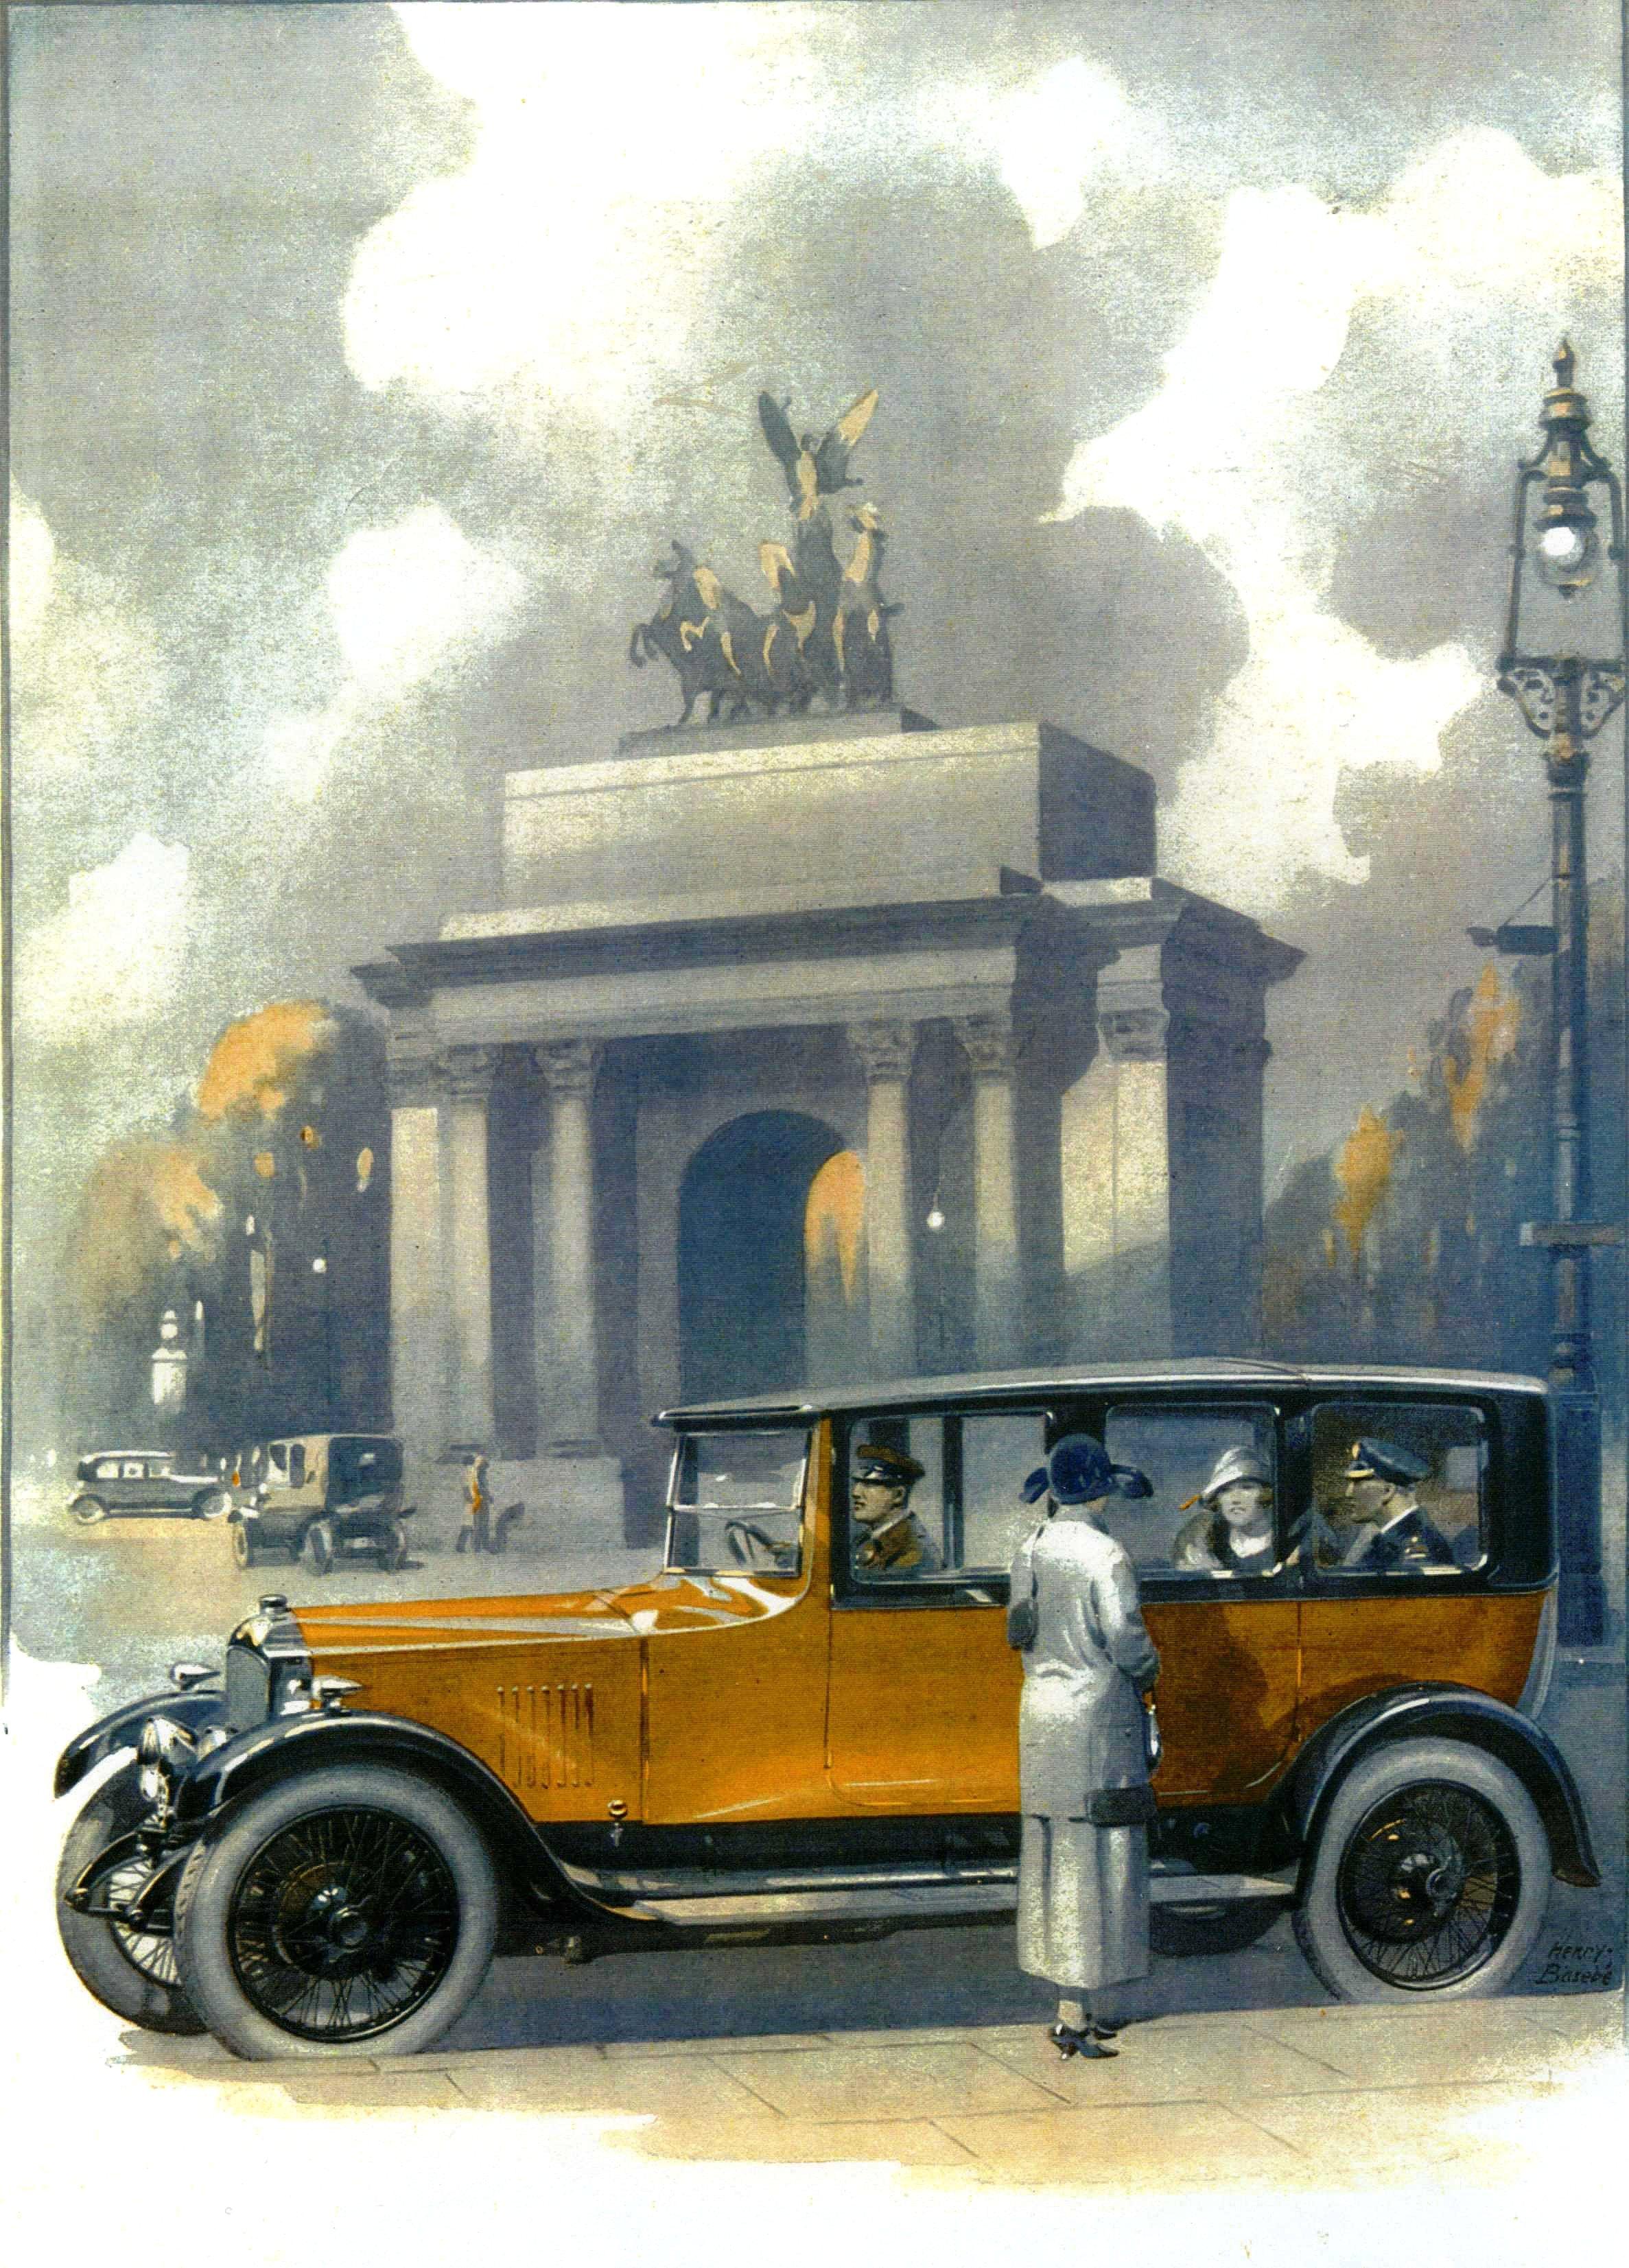 1922 OD Vauxhall - on a calm evening.